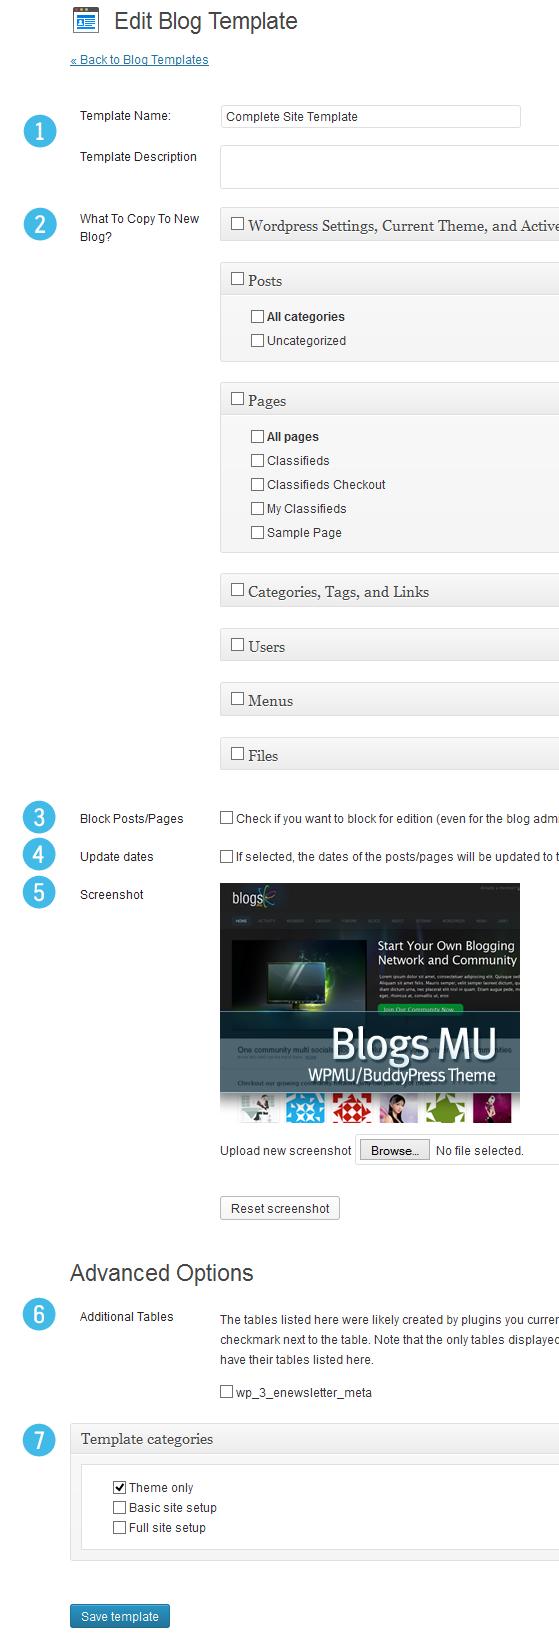 GitHub - wpmudev/blogtemplates: New Blog Templates